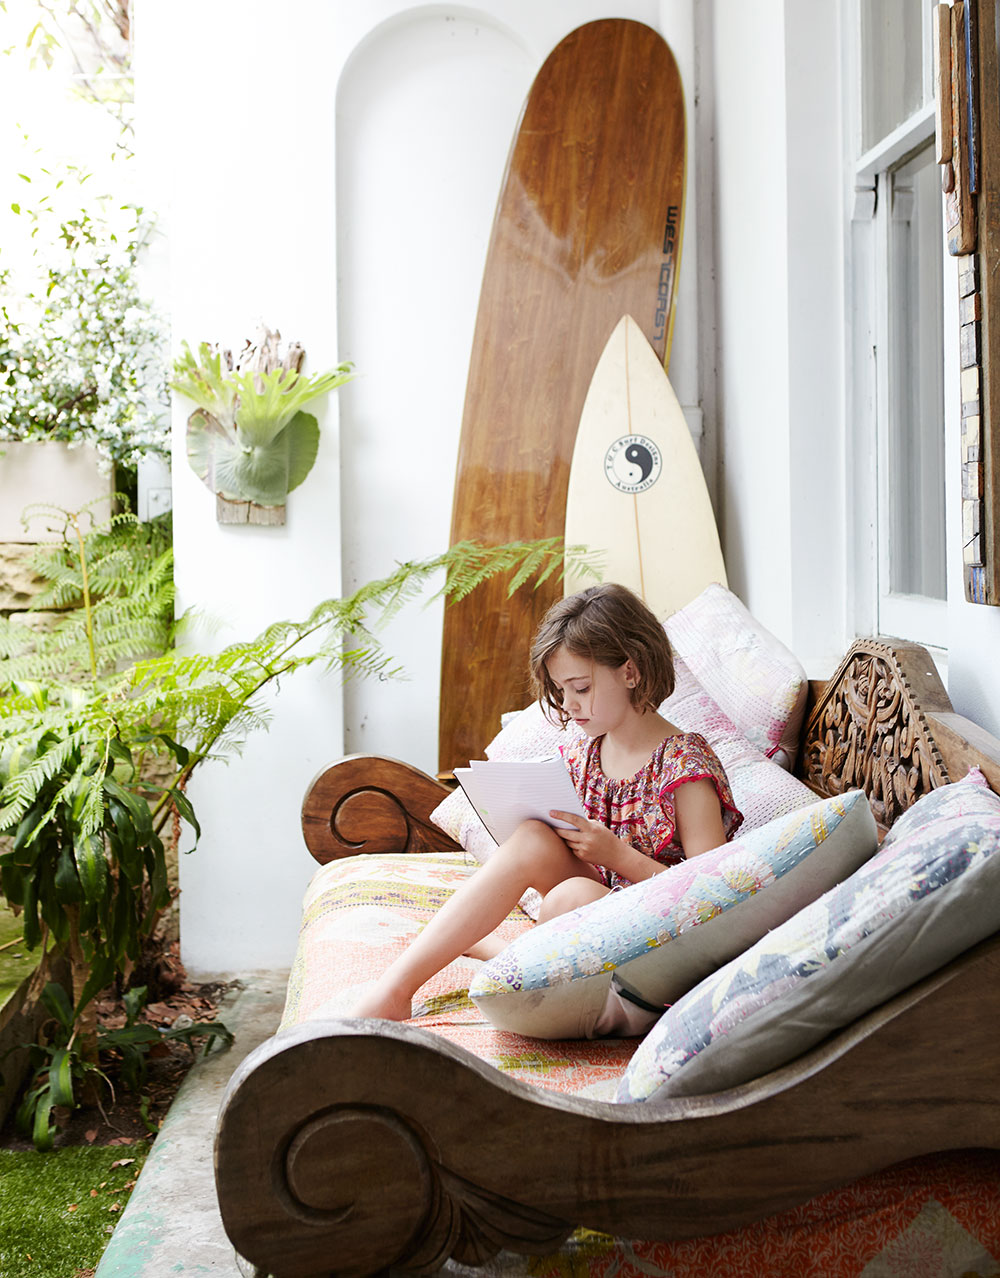 tropical_garden_courtyard-surfboards.jpg